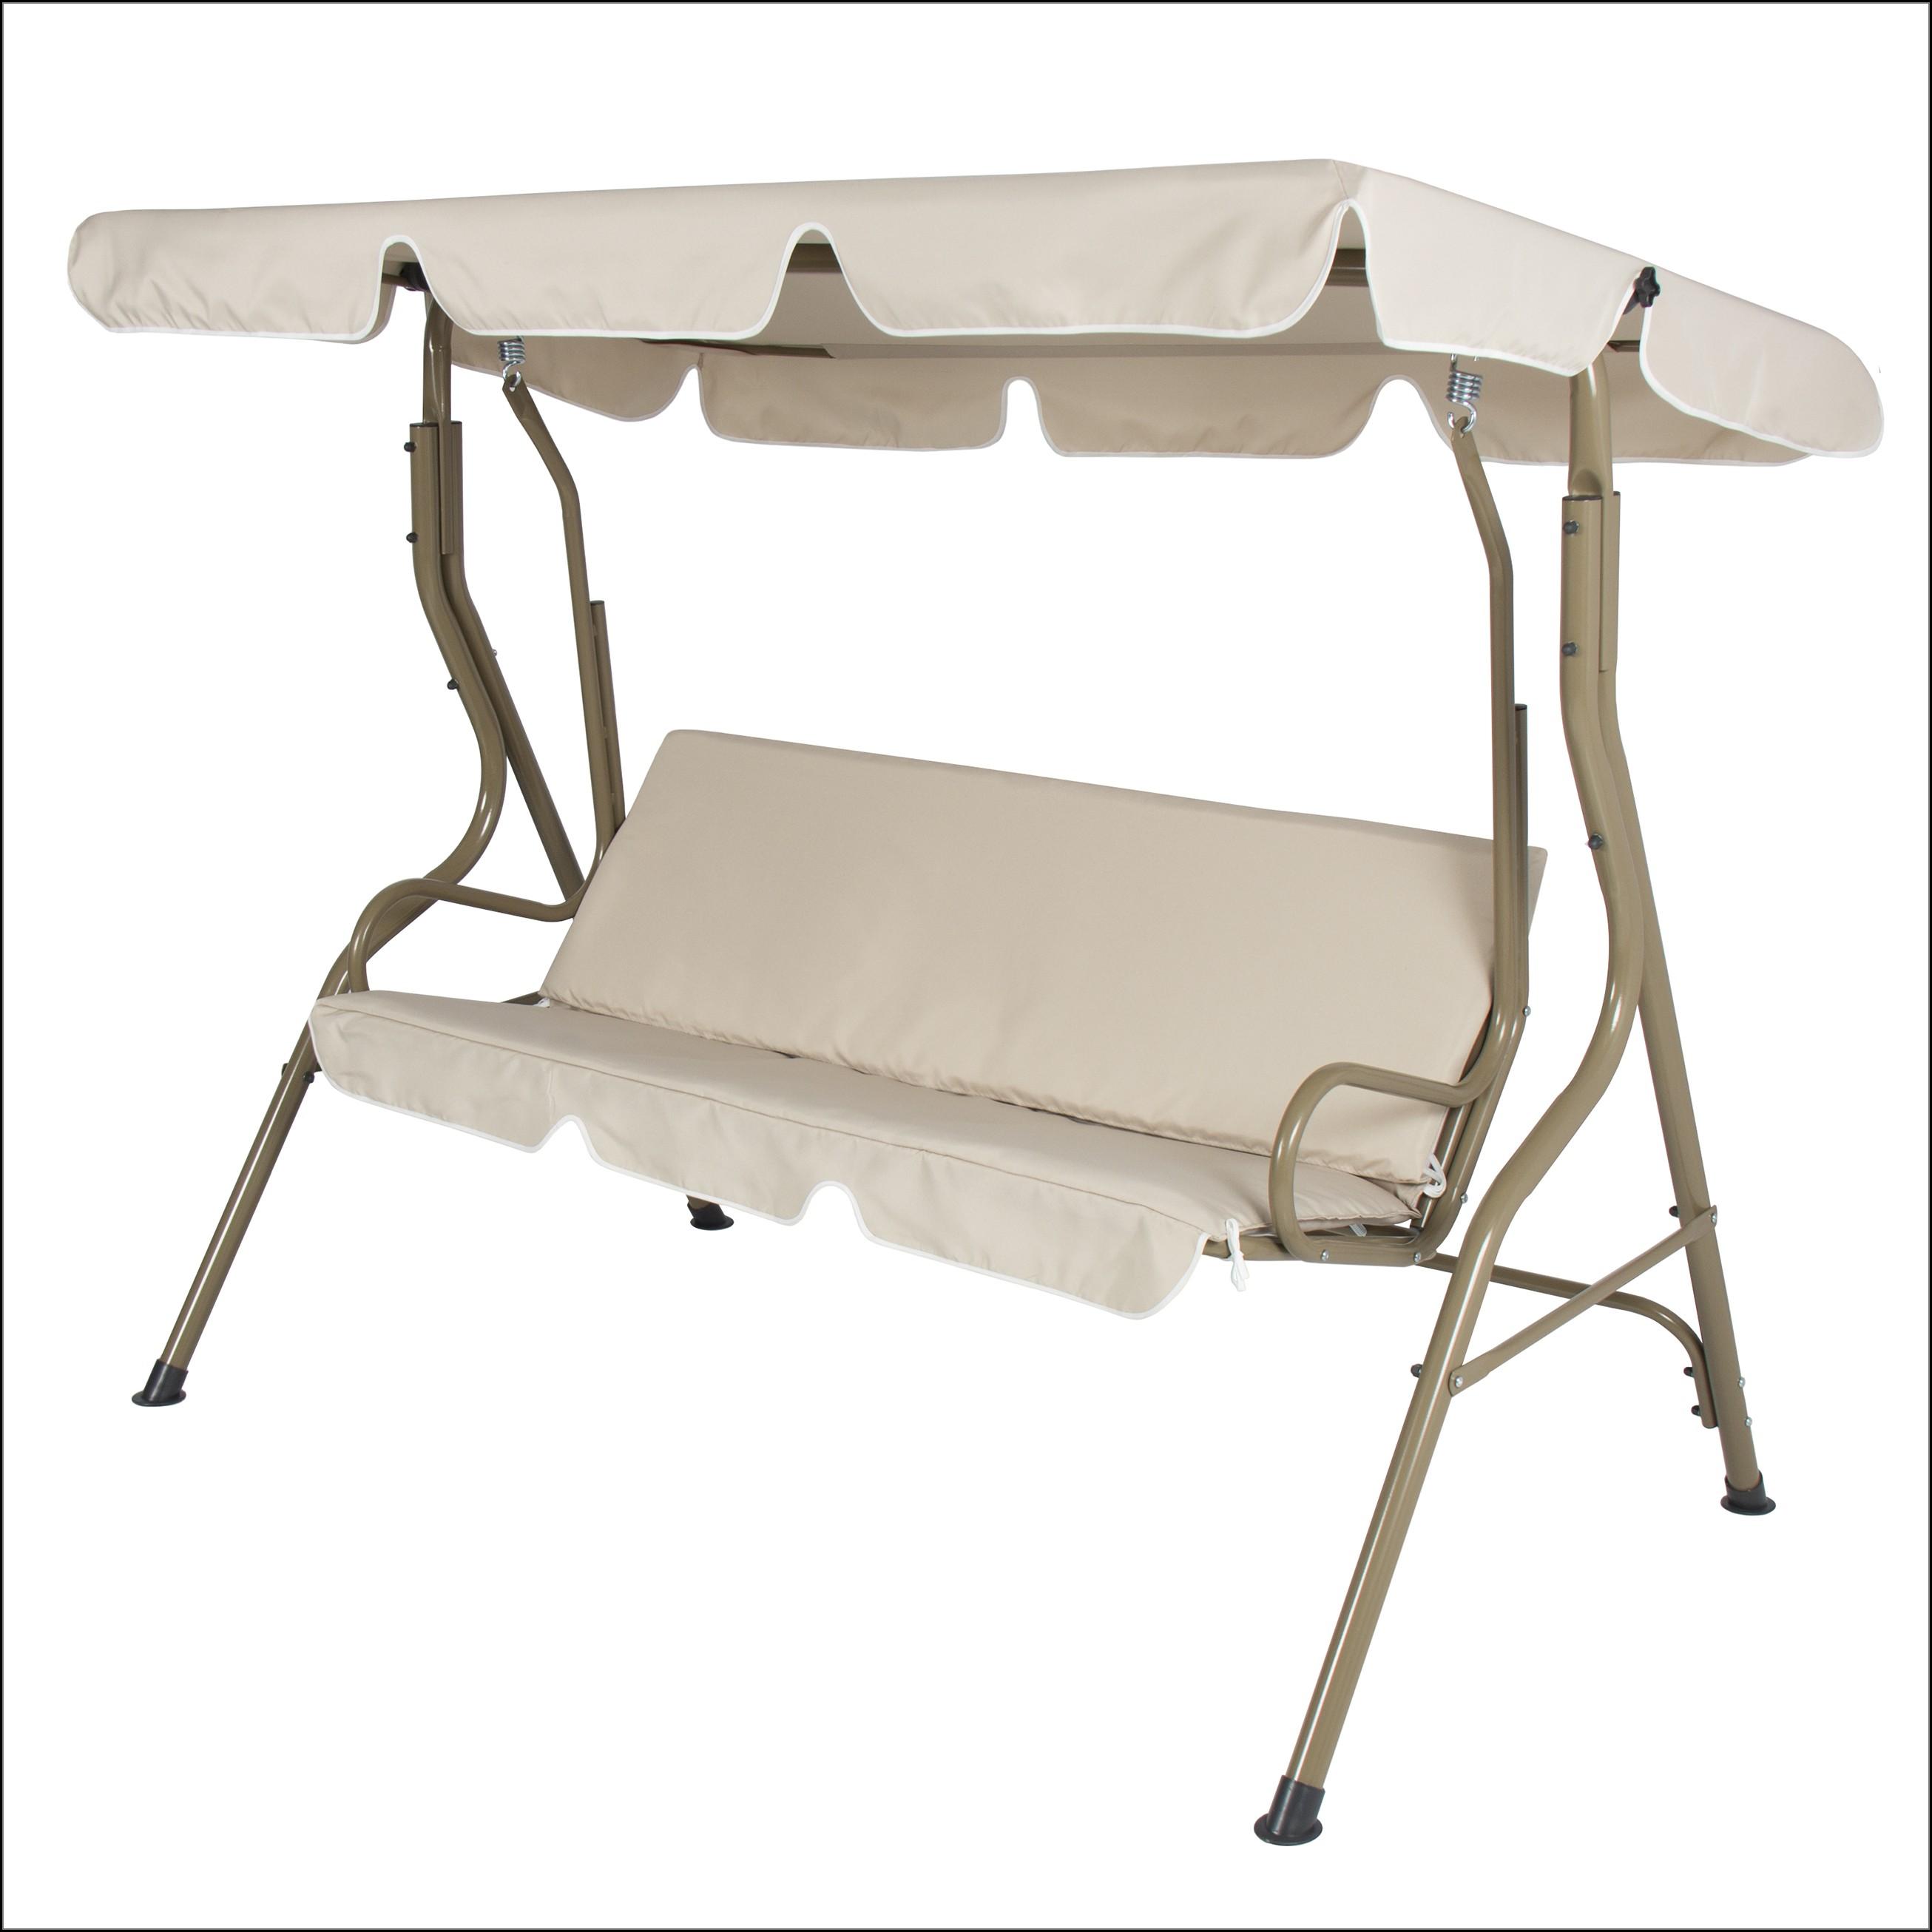 Walmart Patio Swing Replacement Cushion Patios Home